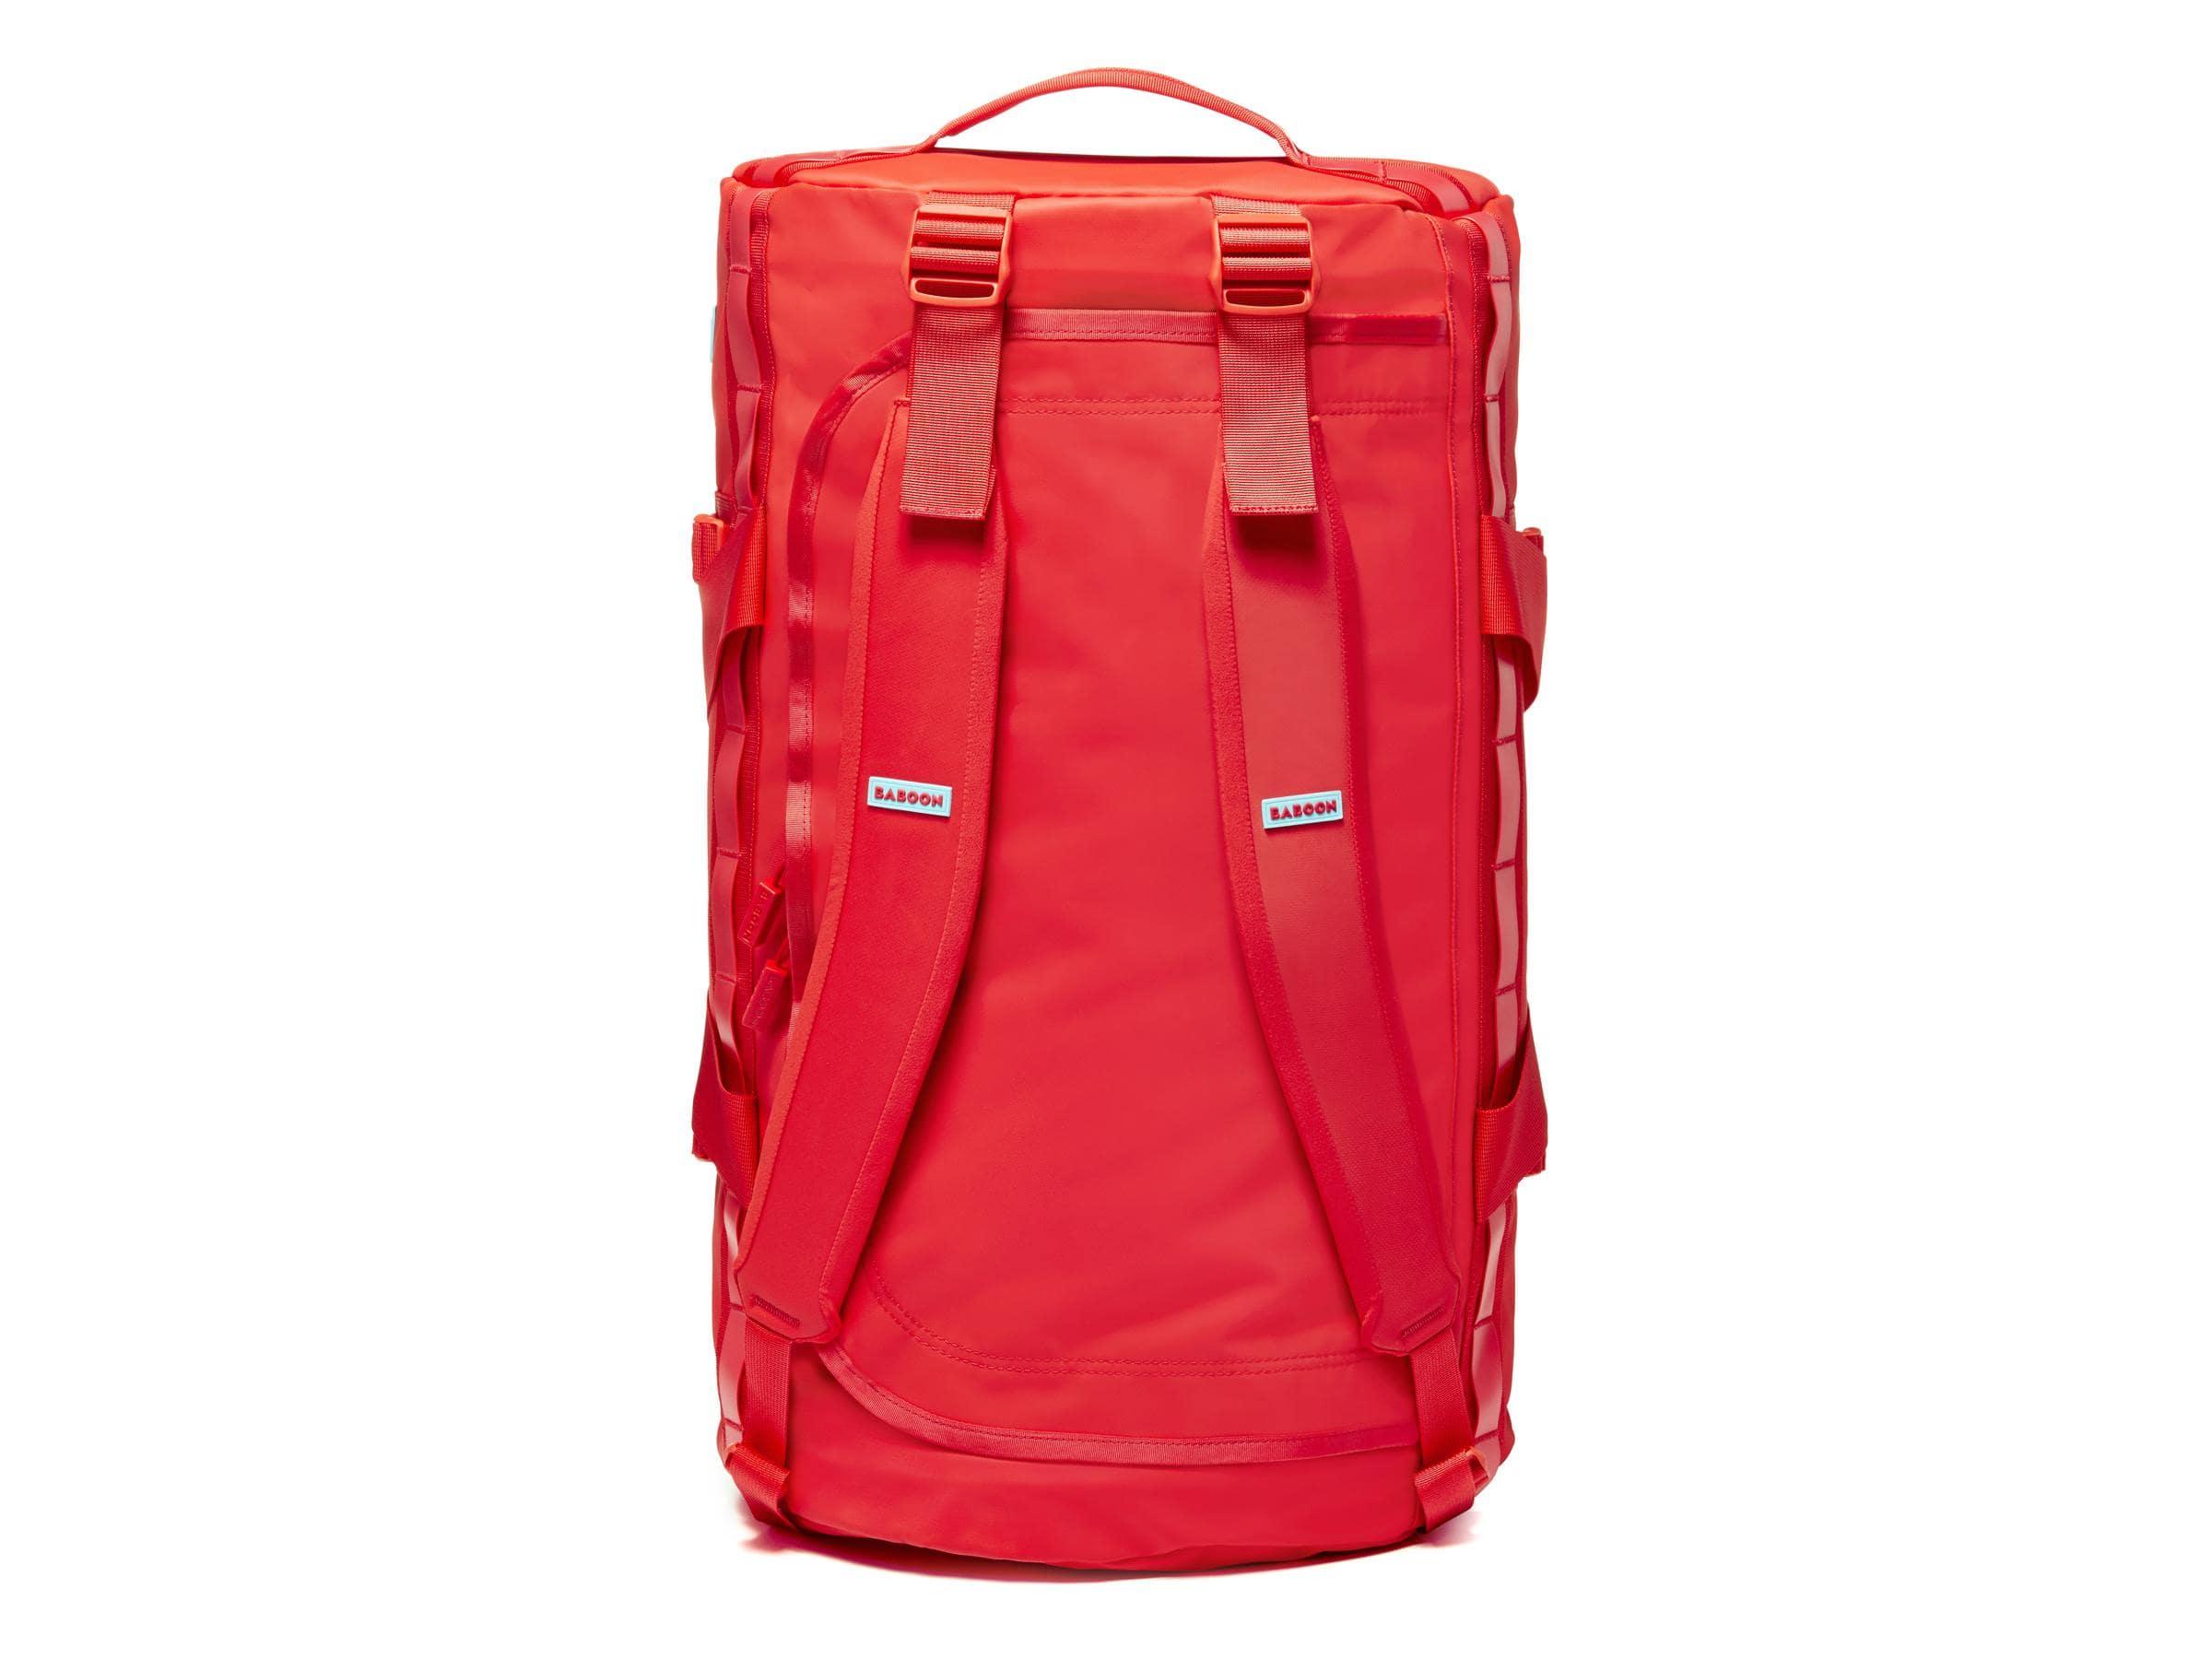 baboon-poppy red-tigernaut-go-bag-large-03-38356